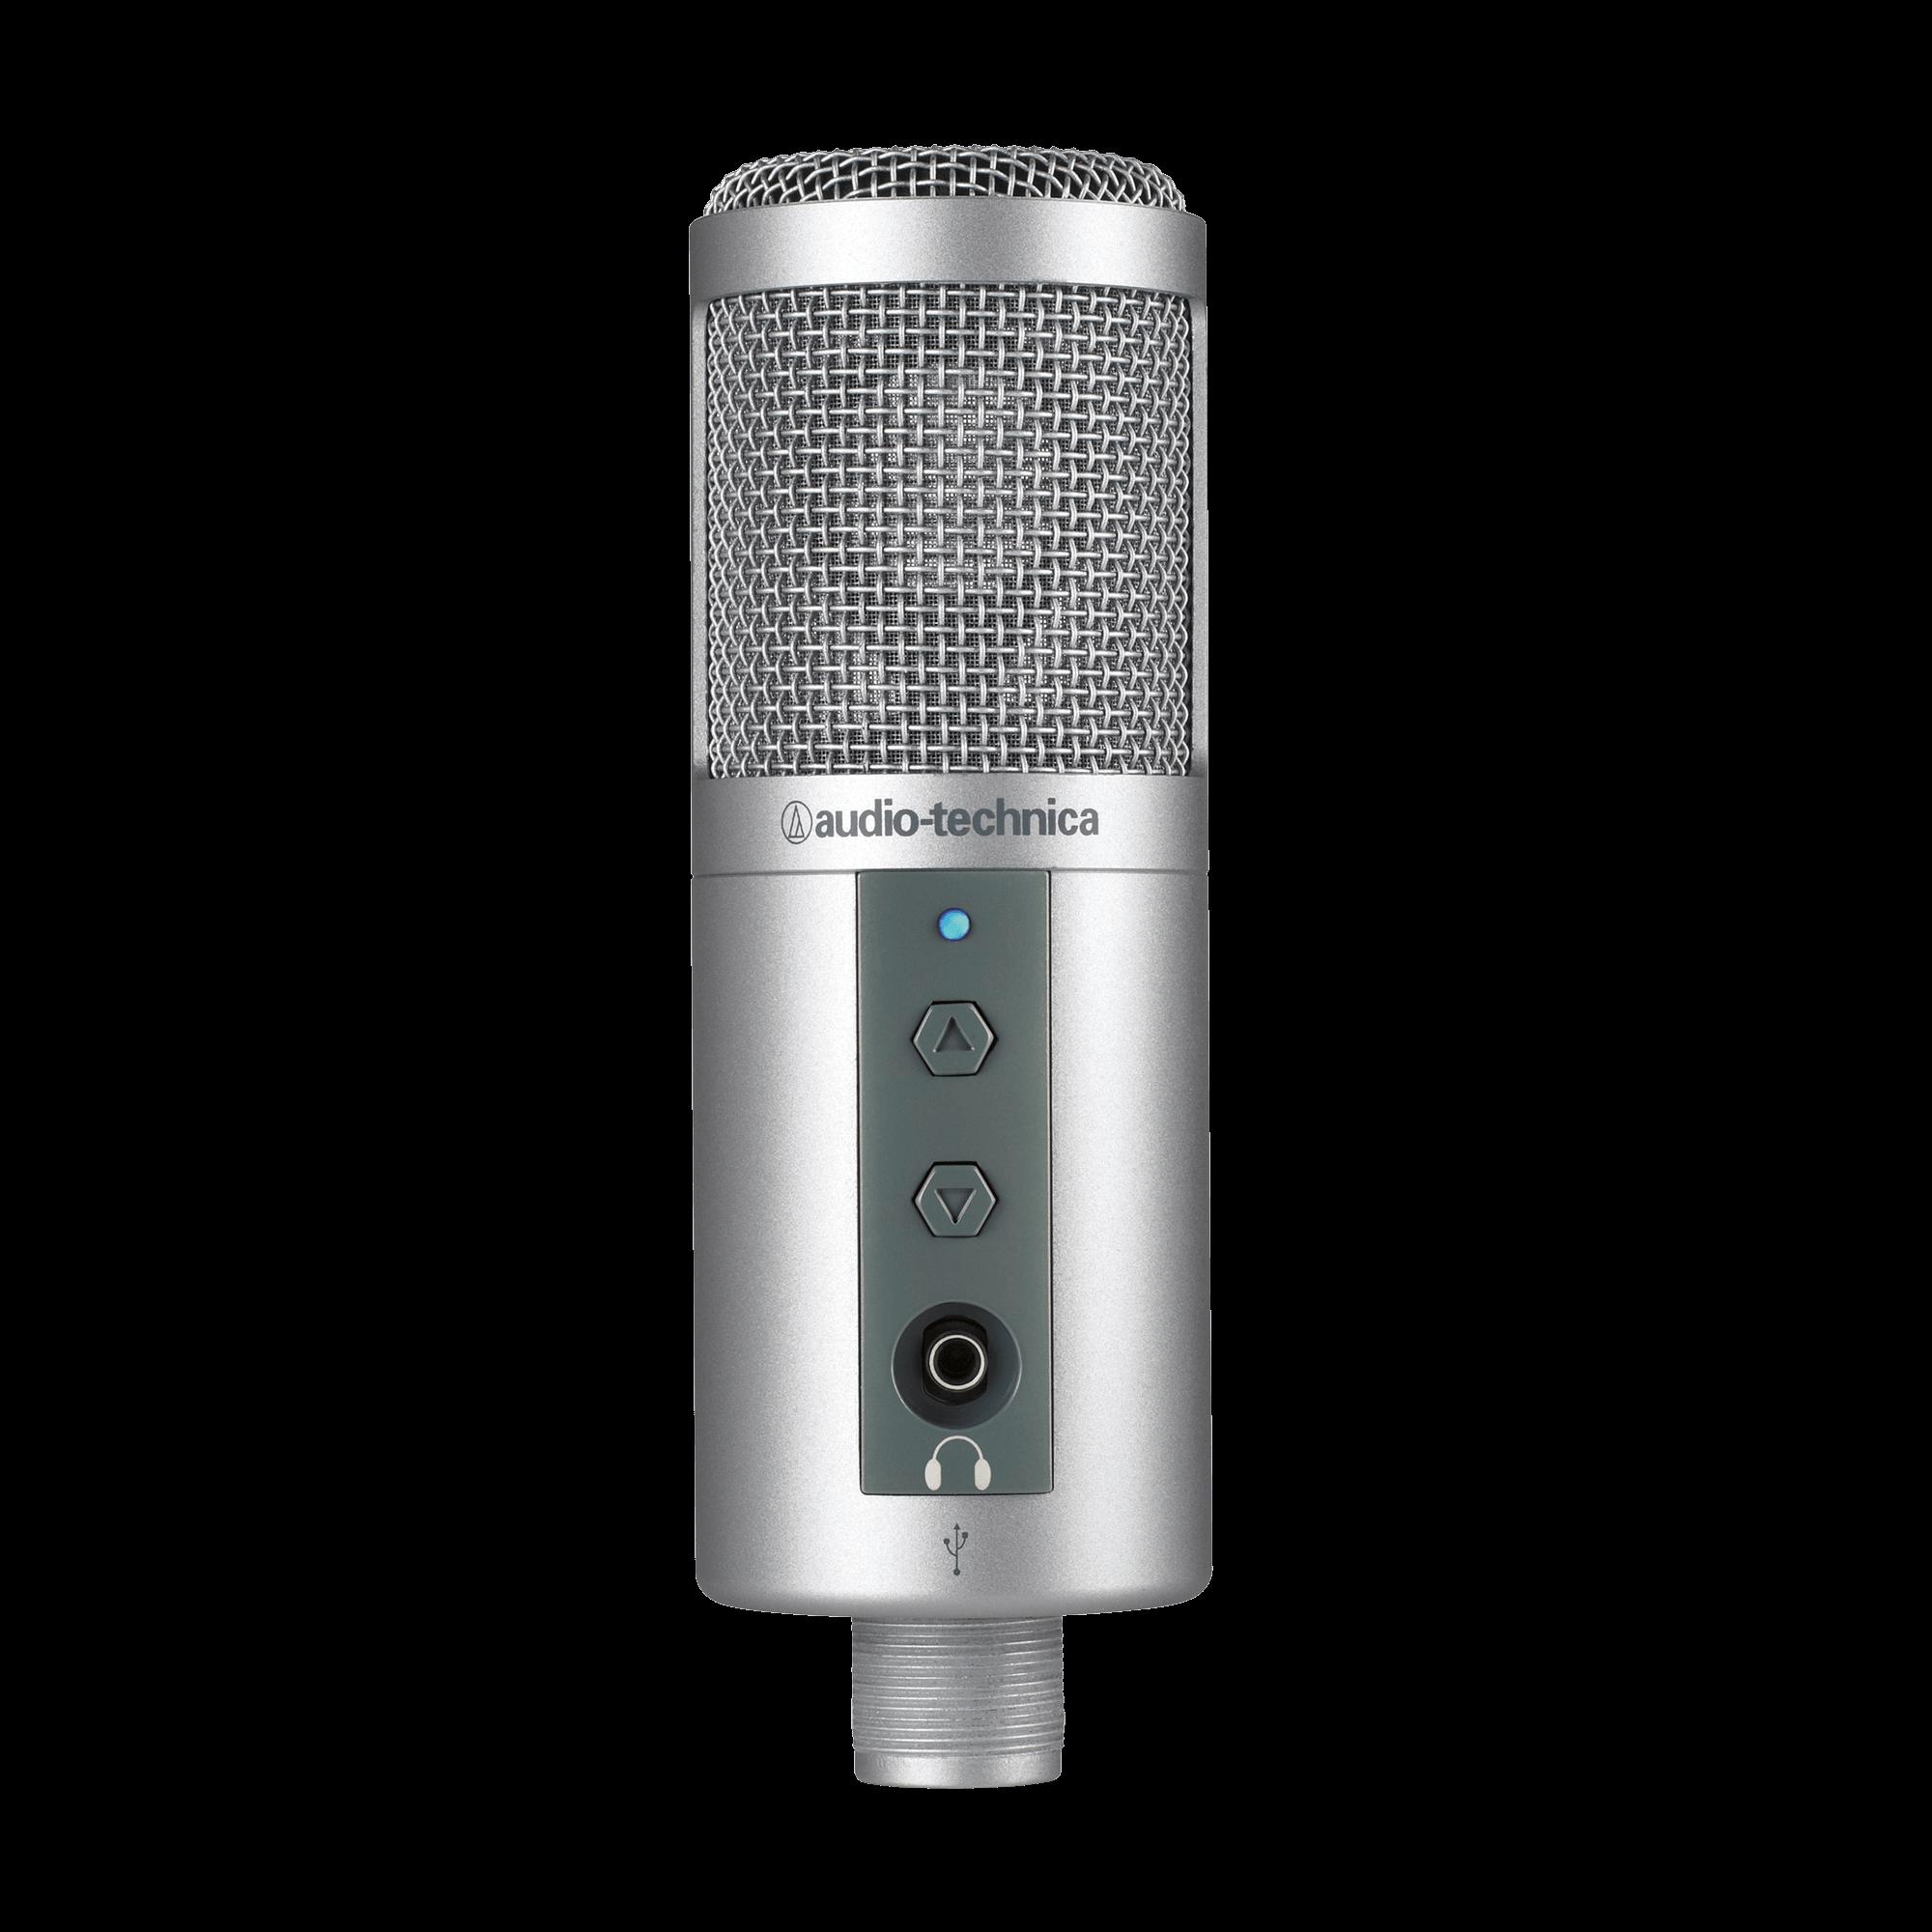 ATR2500-USB - Cardioid Condenser USB Microphone | Audio-Technica